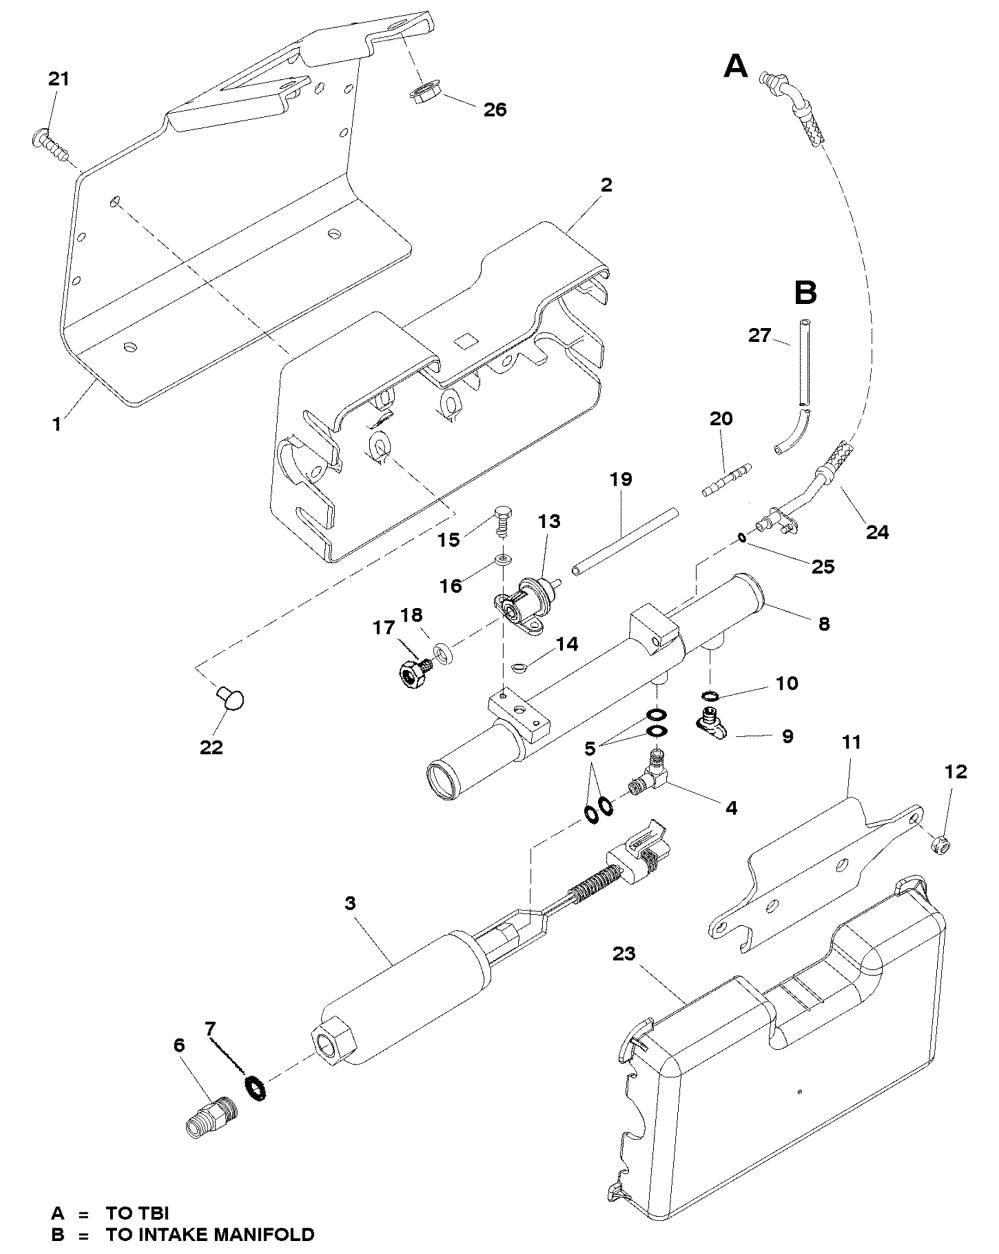 medium resolution of fuel pump and fuel cooler for mercruiser 350 mag mpi bravo rh jamestowndistributors com mercruiser 5 7 engine diagram mercruiser alpha one diagram